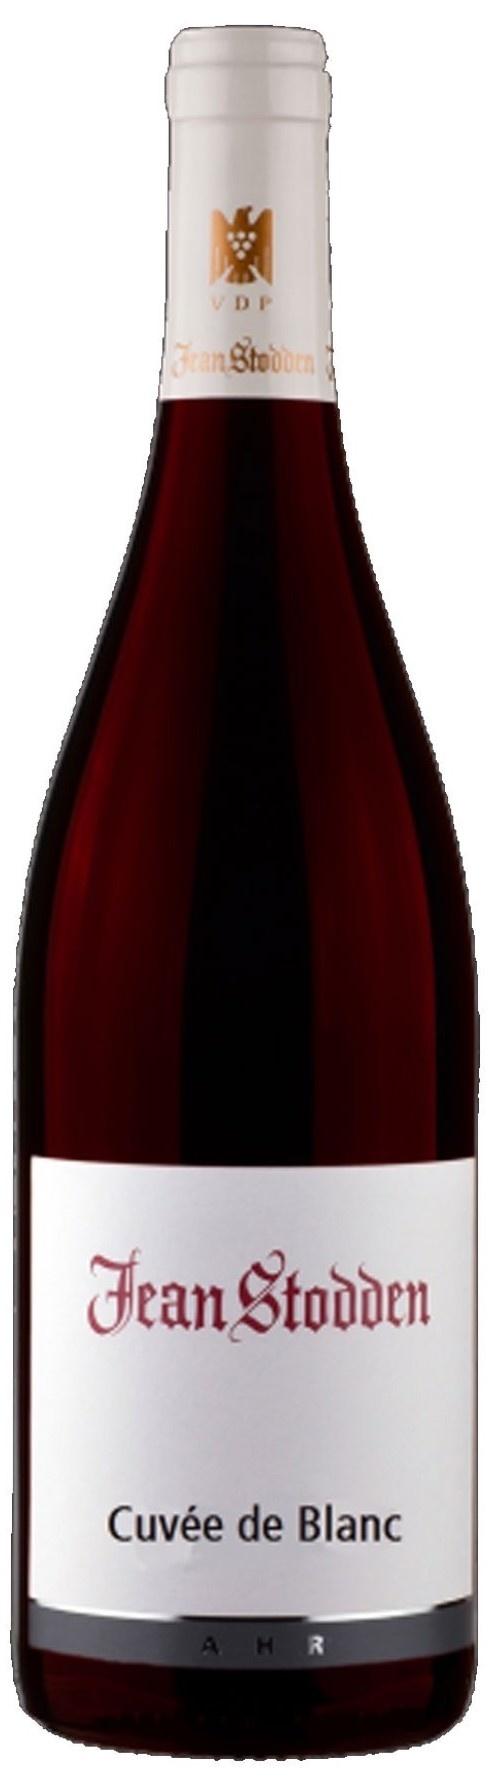 Weingut Jean Stodden Riesling, Cuvée de Blanc 2017-1